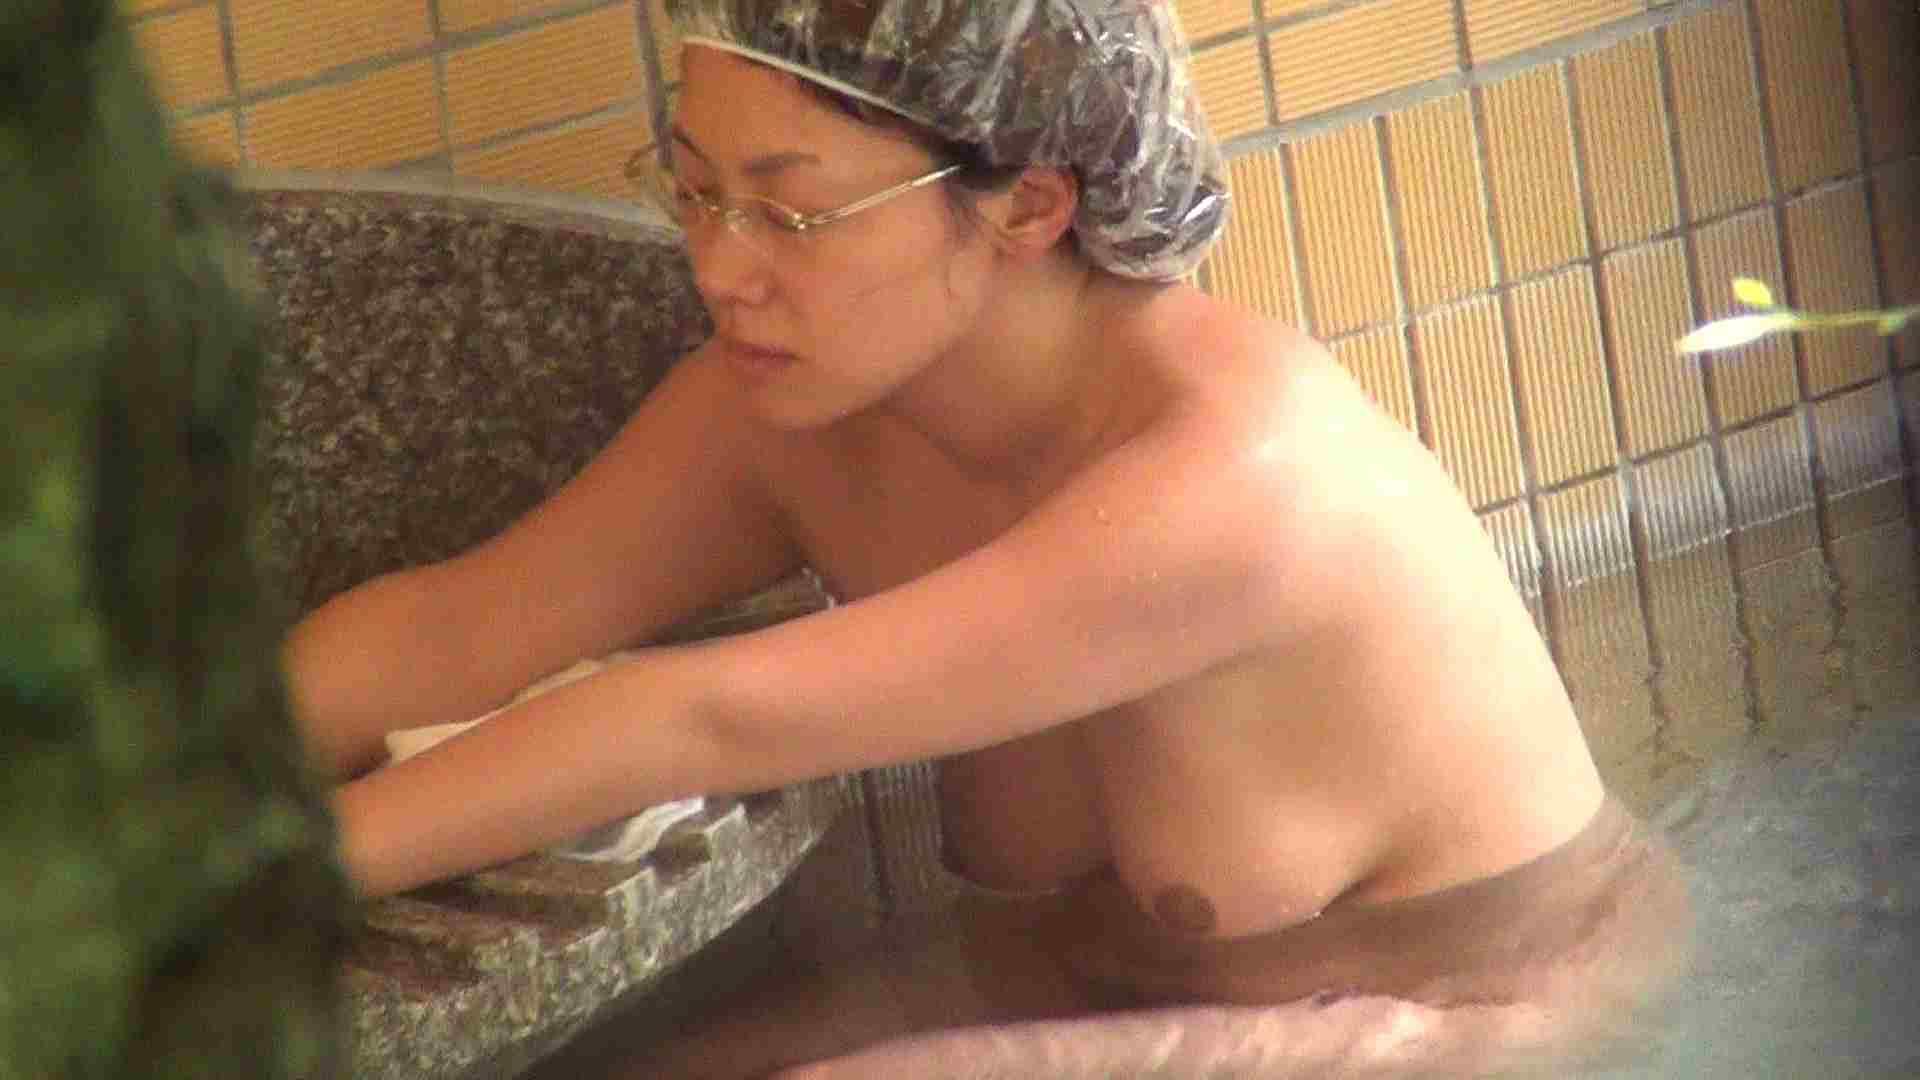 Aquaな露天風呂Vol.280 OLセックス  91画像 9